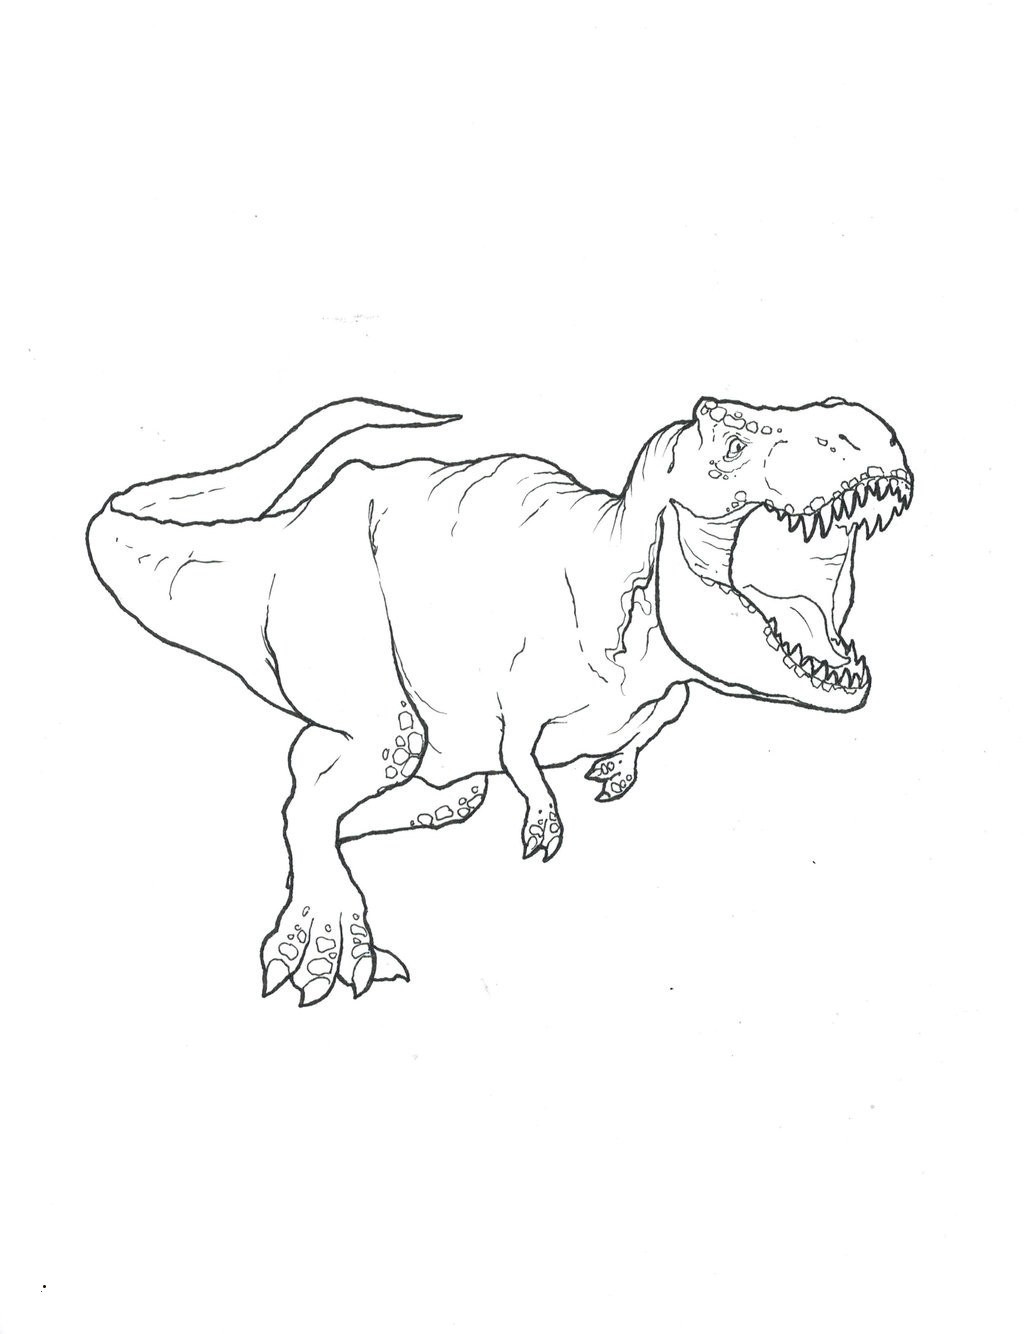 Ausmalbilder Dinosaurier Rex Genial 44 Idee Ausmalbilder Tyrannosaurus Rex Treehouse Nyc Fotos